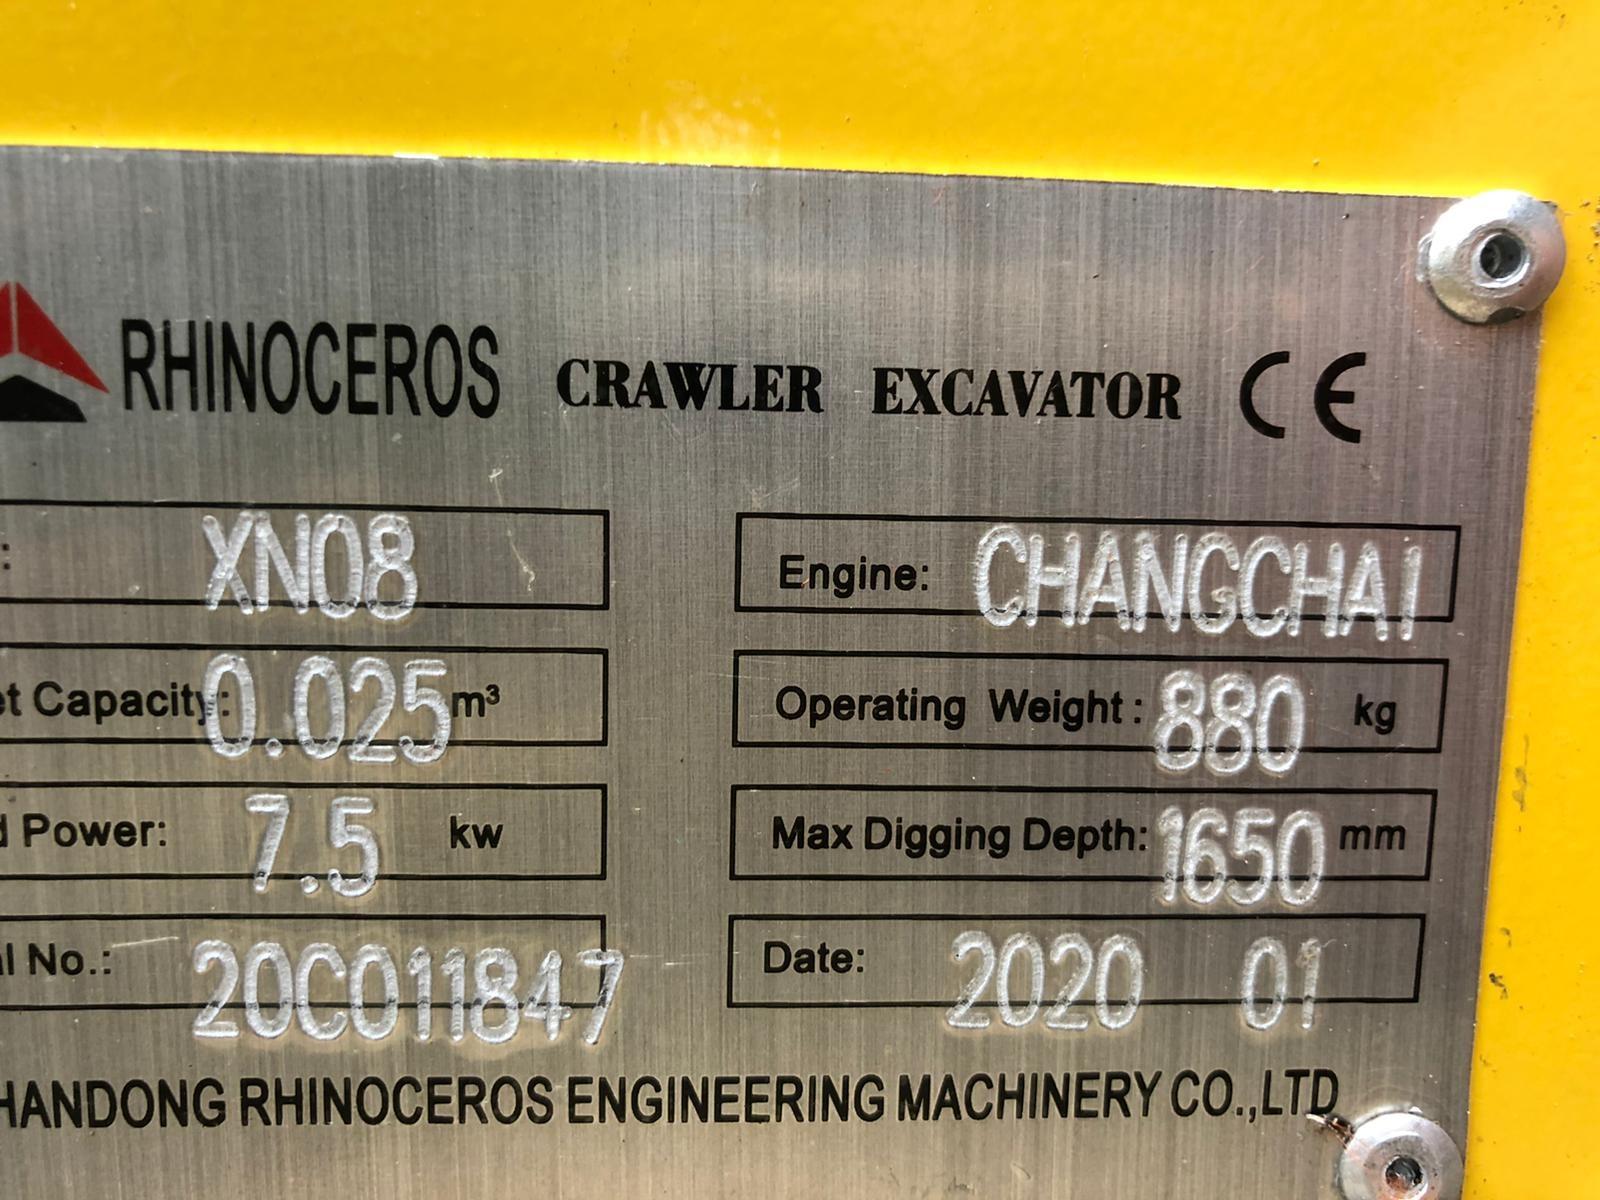 Lot 81 - 2020 NEW & UNUSED MINI TRACKED EXCAVATOR MICRO RHINOCEROS XN08 C/W 3 X BUCKETS & GRAPPLE *PLUS VAT*